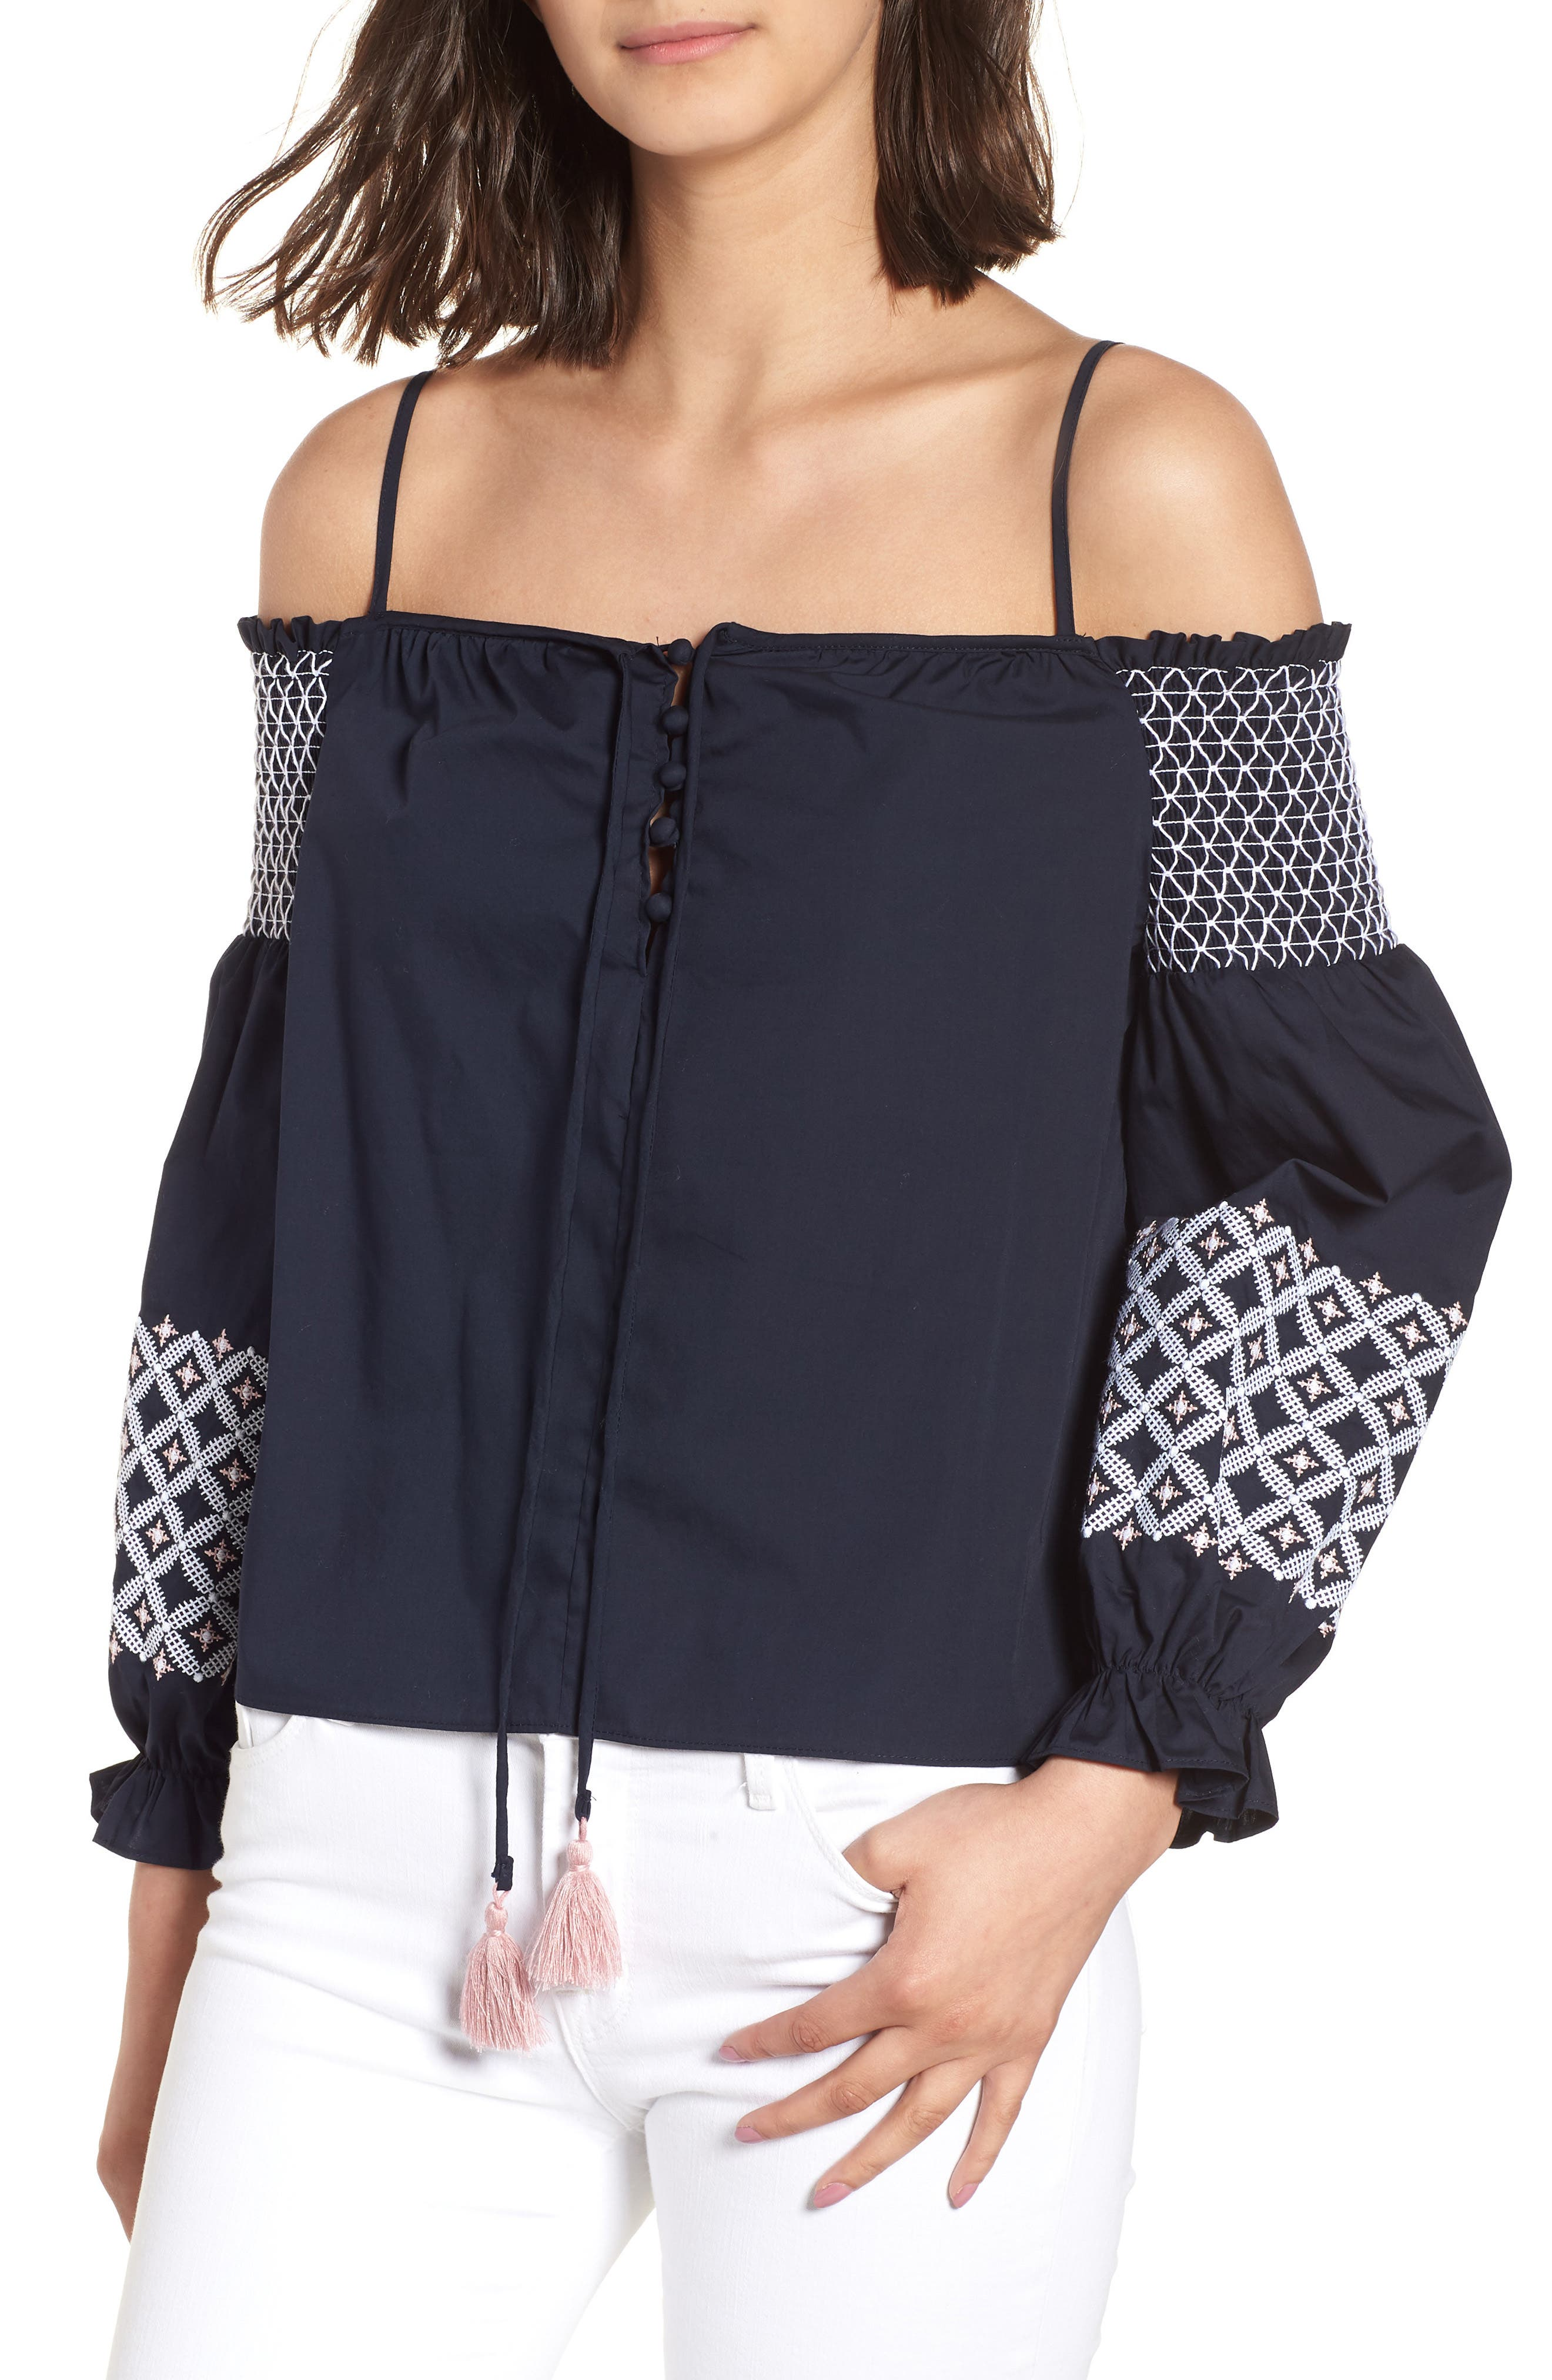 Rebecca Minkoff Tiffany Embroidered Cold Shoulder Top